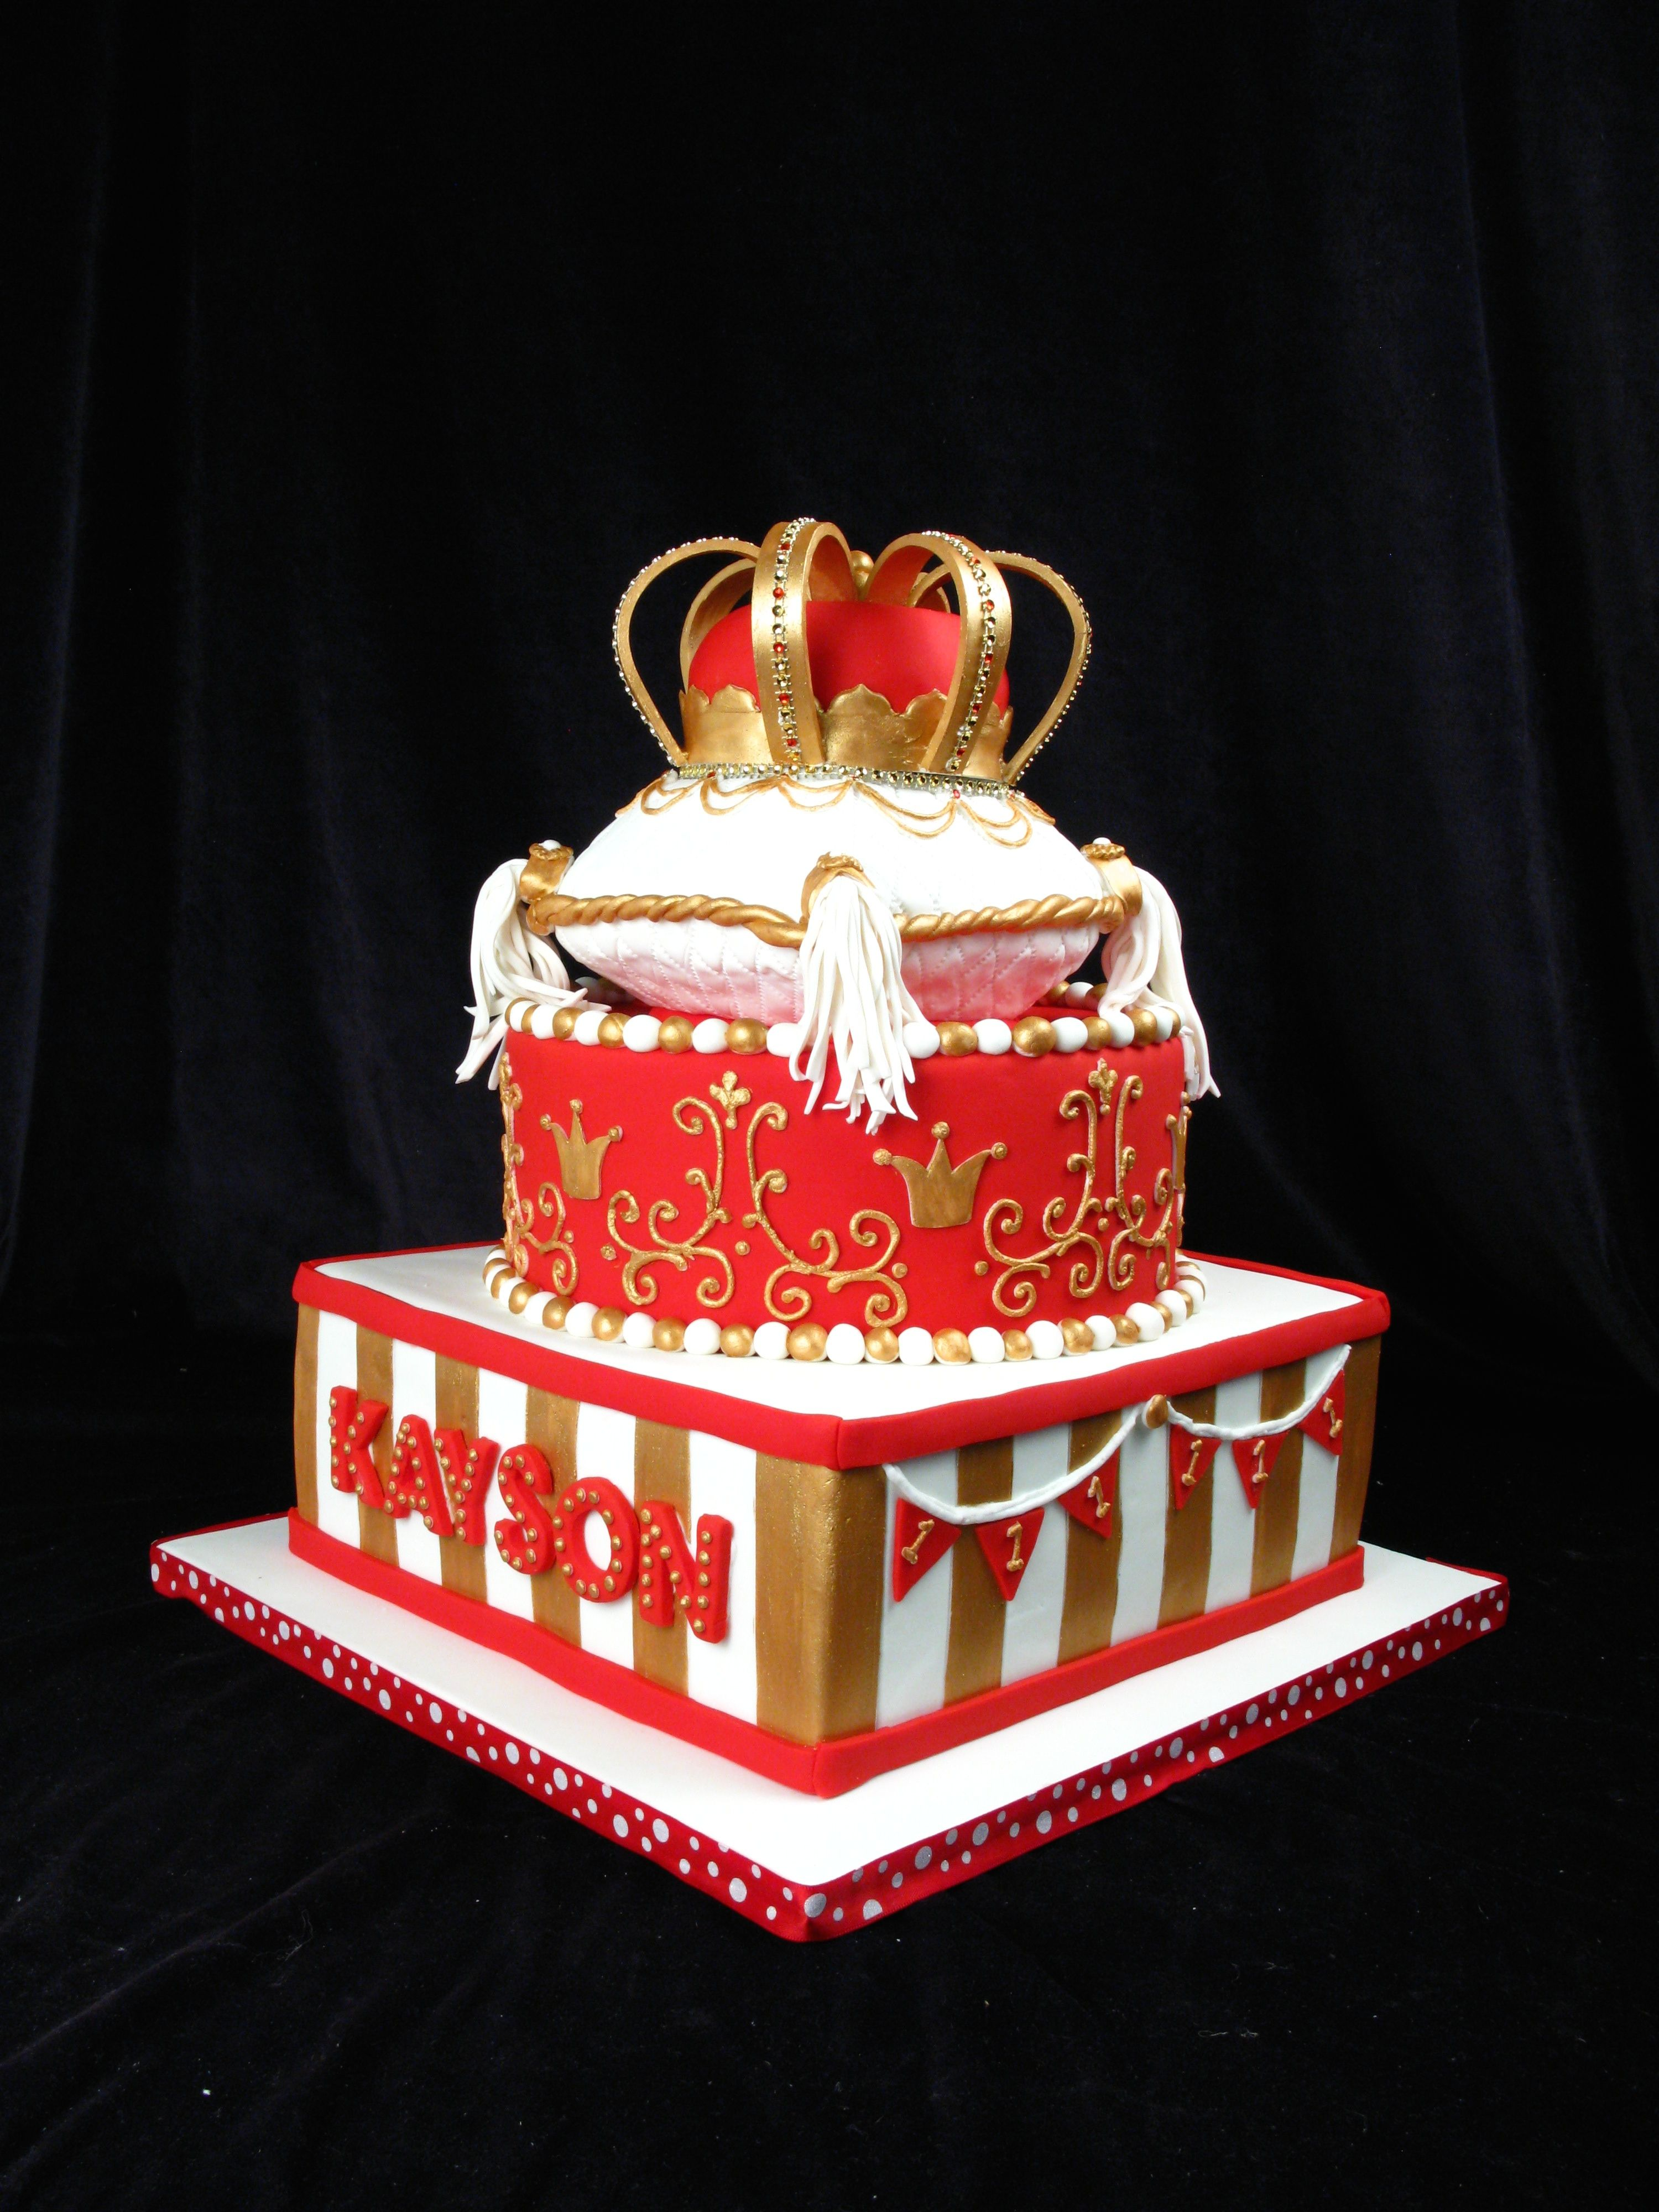 King Crown Birthday Cake  www.galleryhip.com - The Hippest Pics